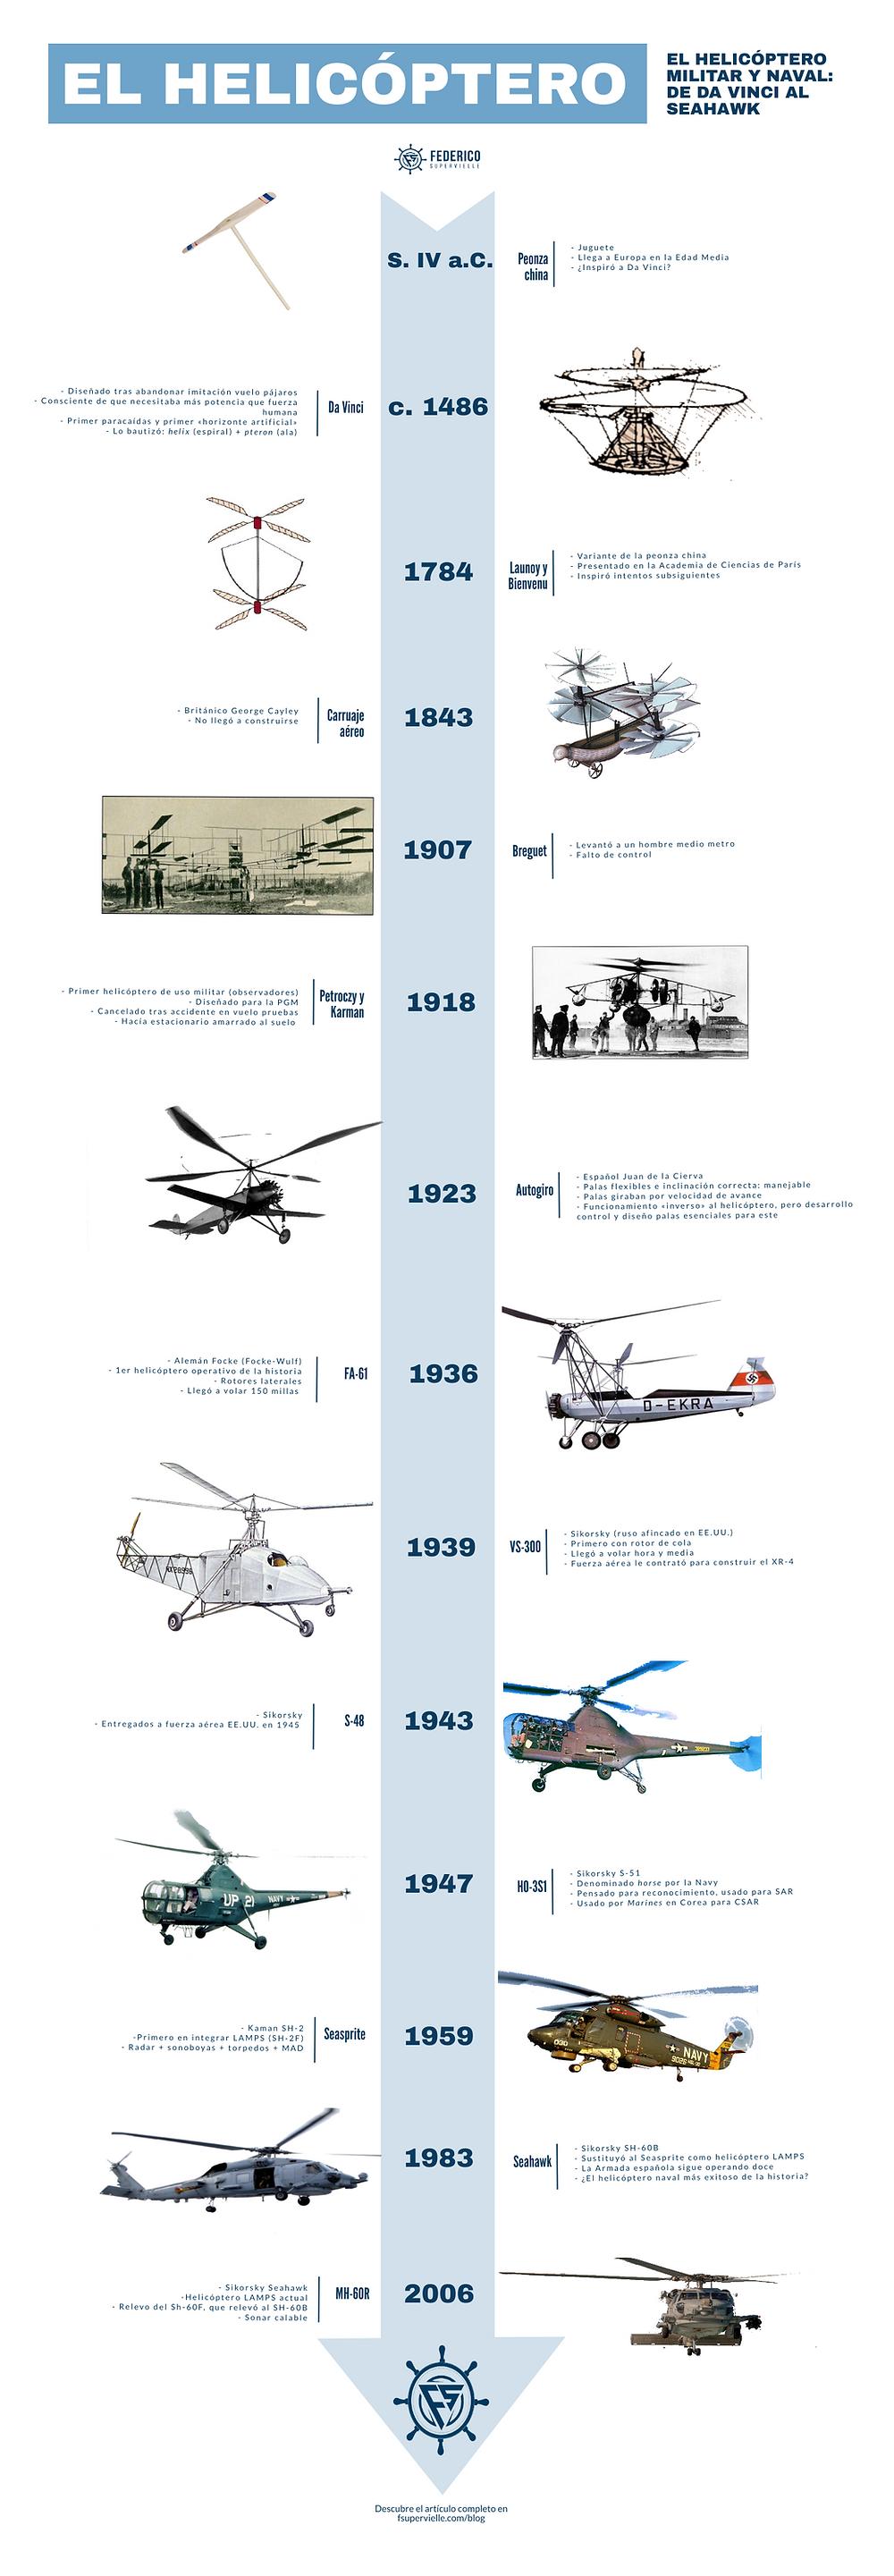 Desarrollo e historia del helicóptero naval